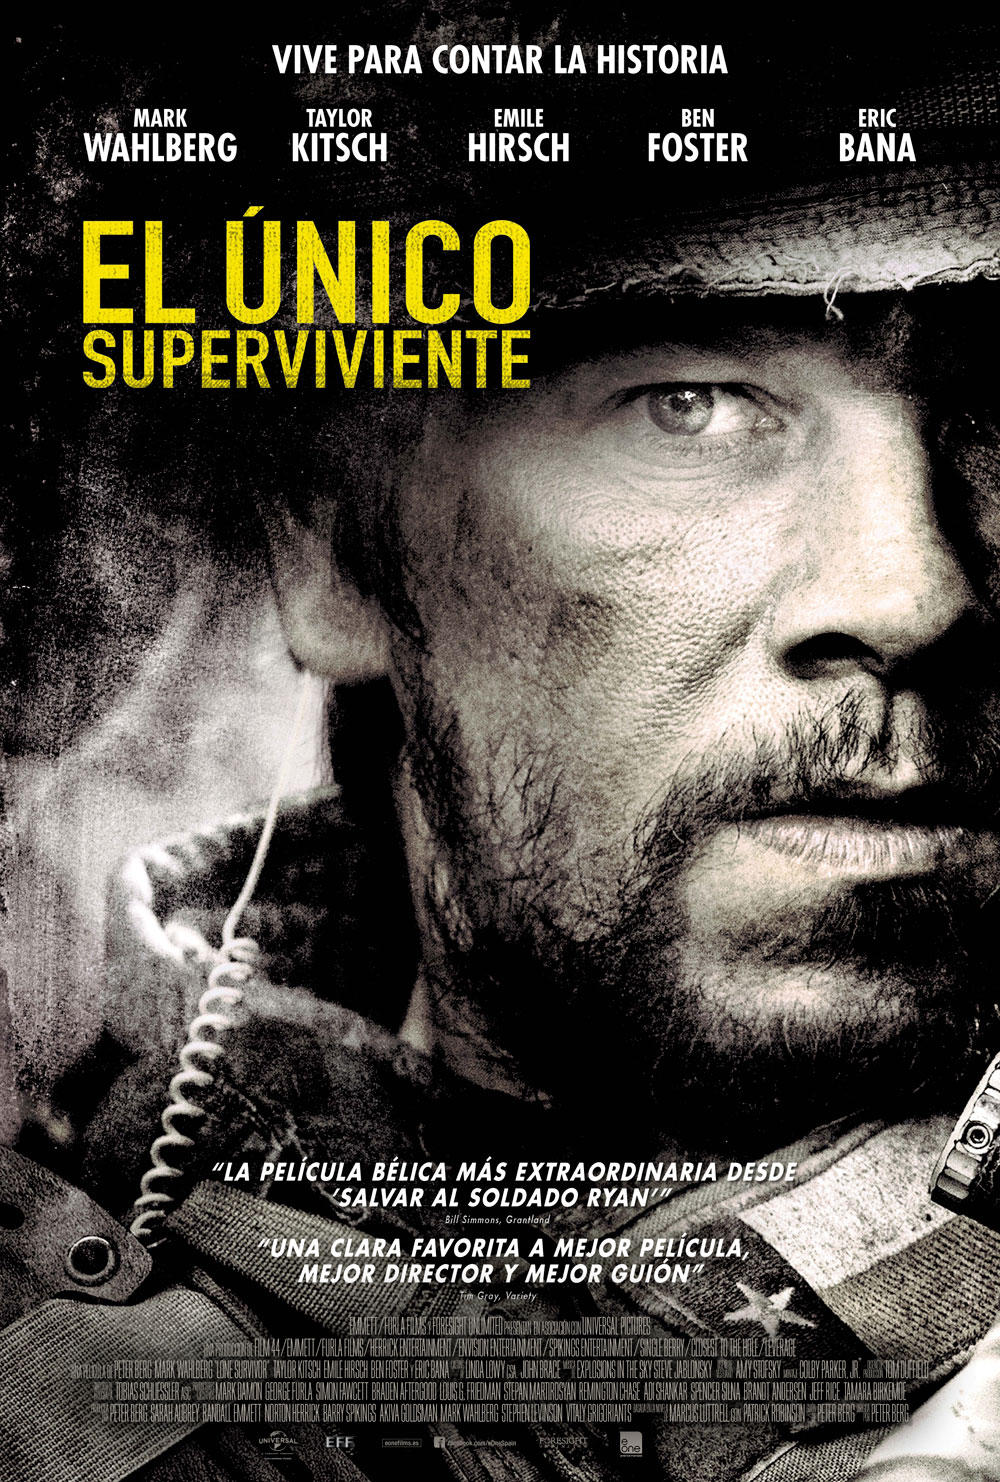 http://www.lahiguera.net/cinemania/pelicula/6496/el_unico_superviviente-cartel-5317.jpg